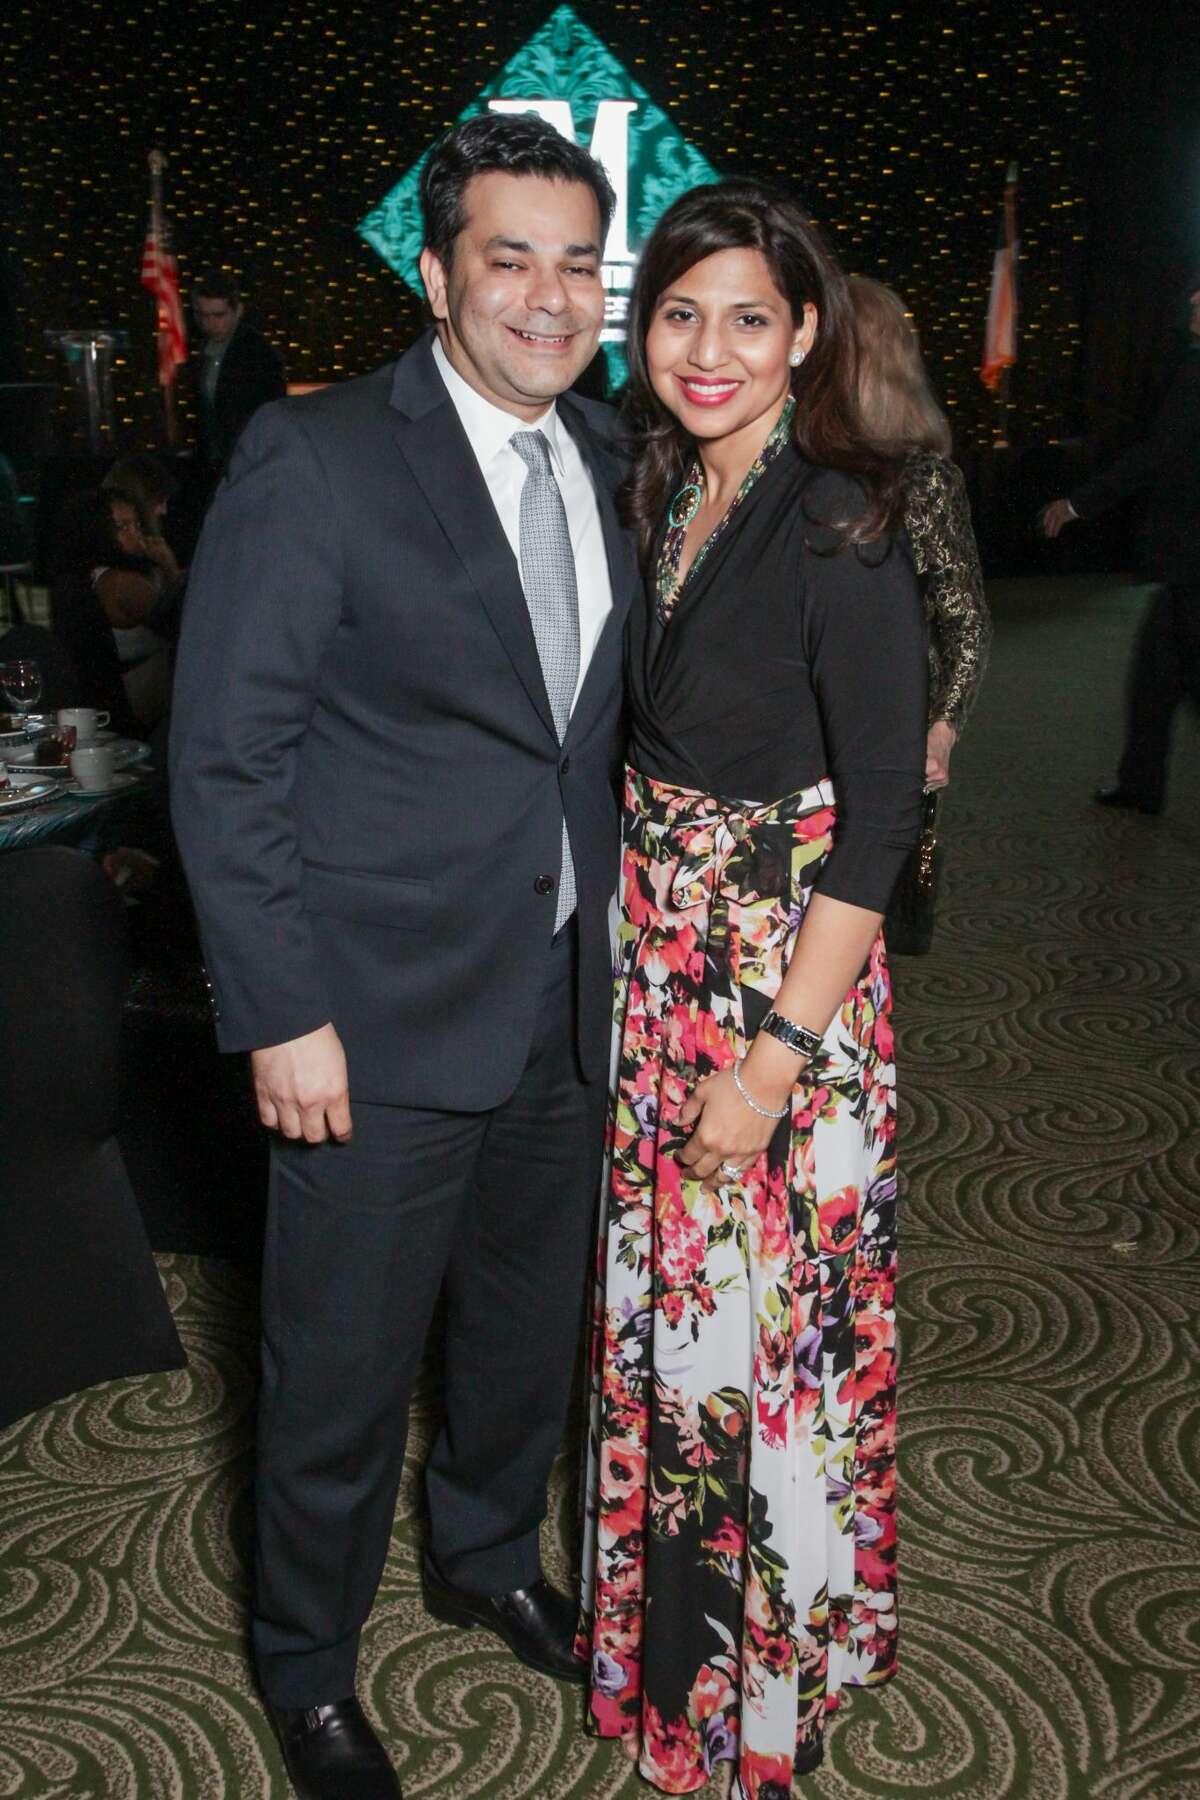 Shaukat and Nihala Zakaria